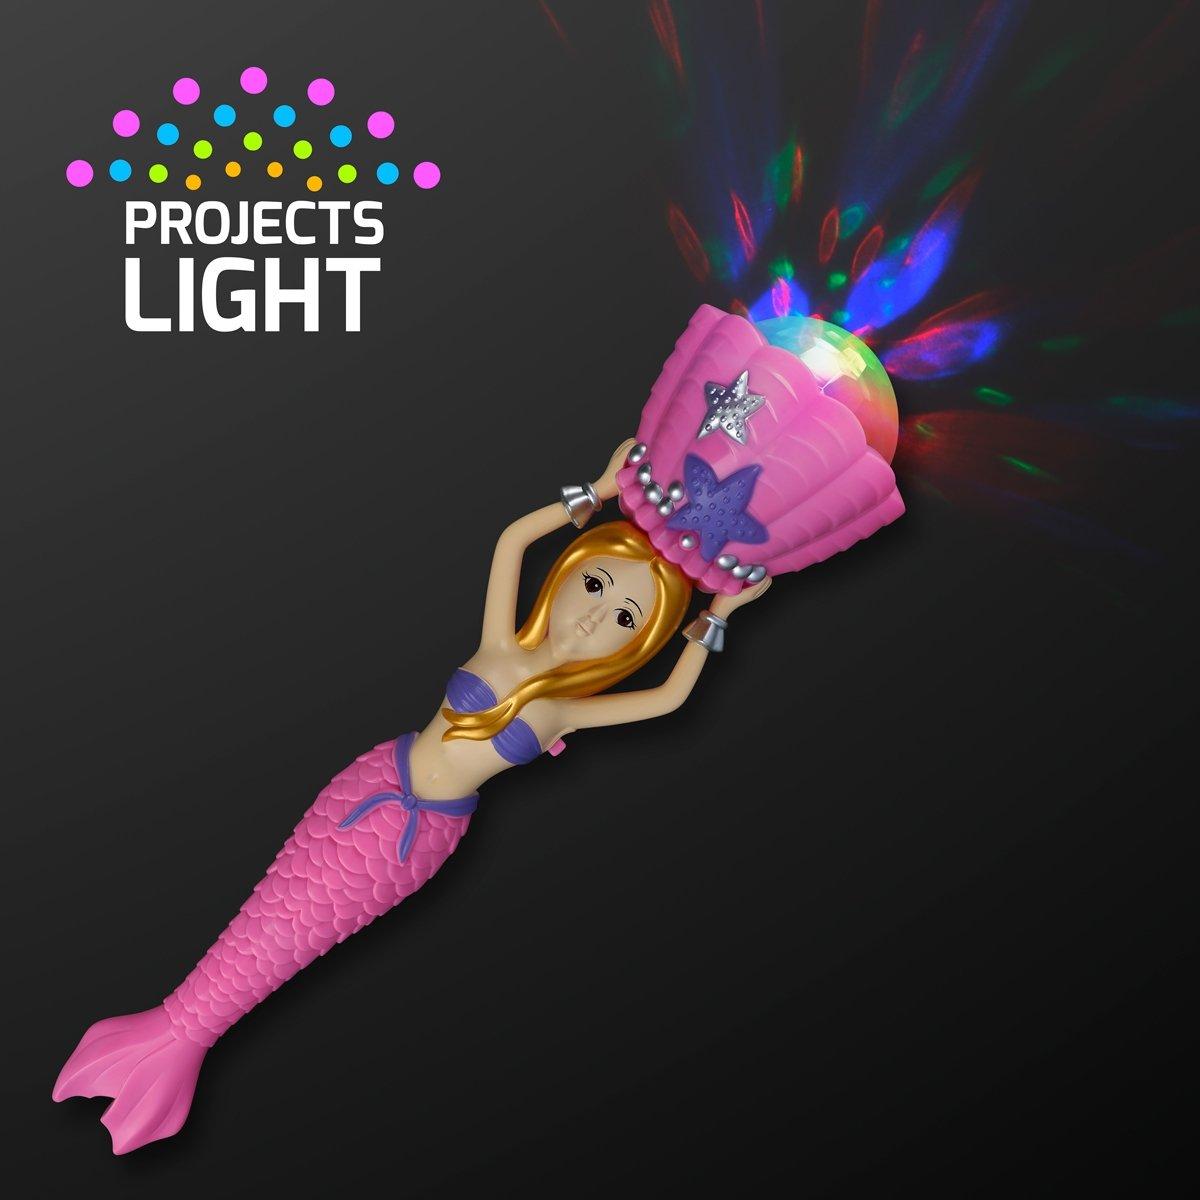 Mermaid Light Up Spinning Wand